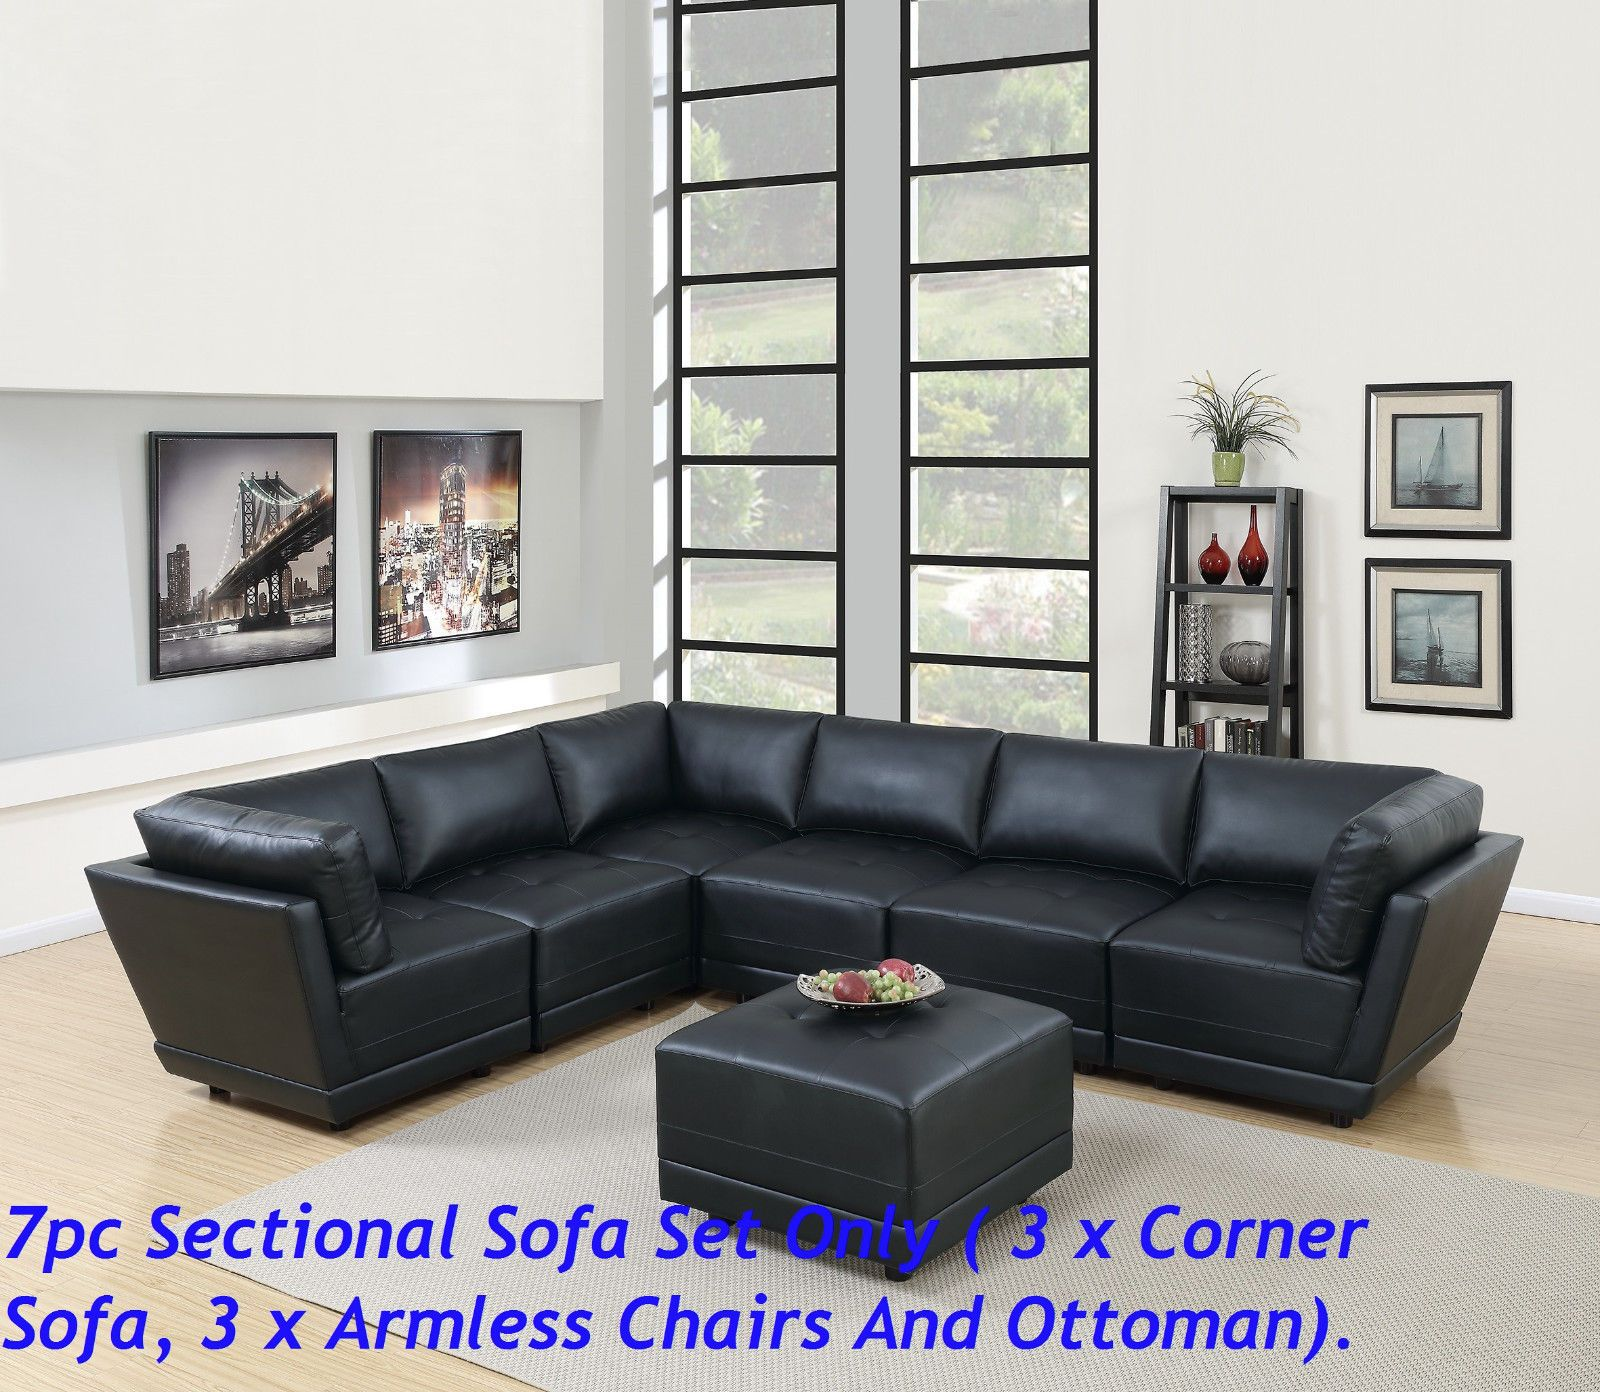 Black Bonded Leather Modular Sectional Sofa 7pc Set Tufted Seat